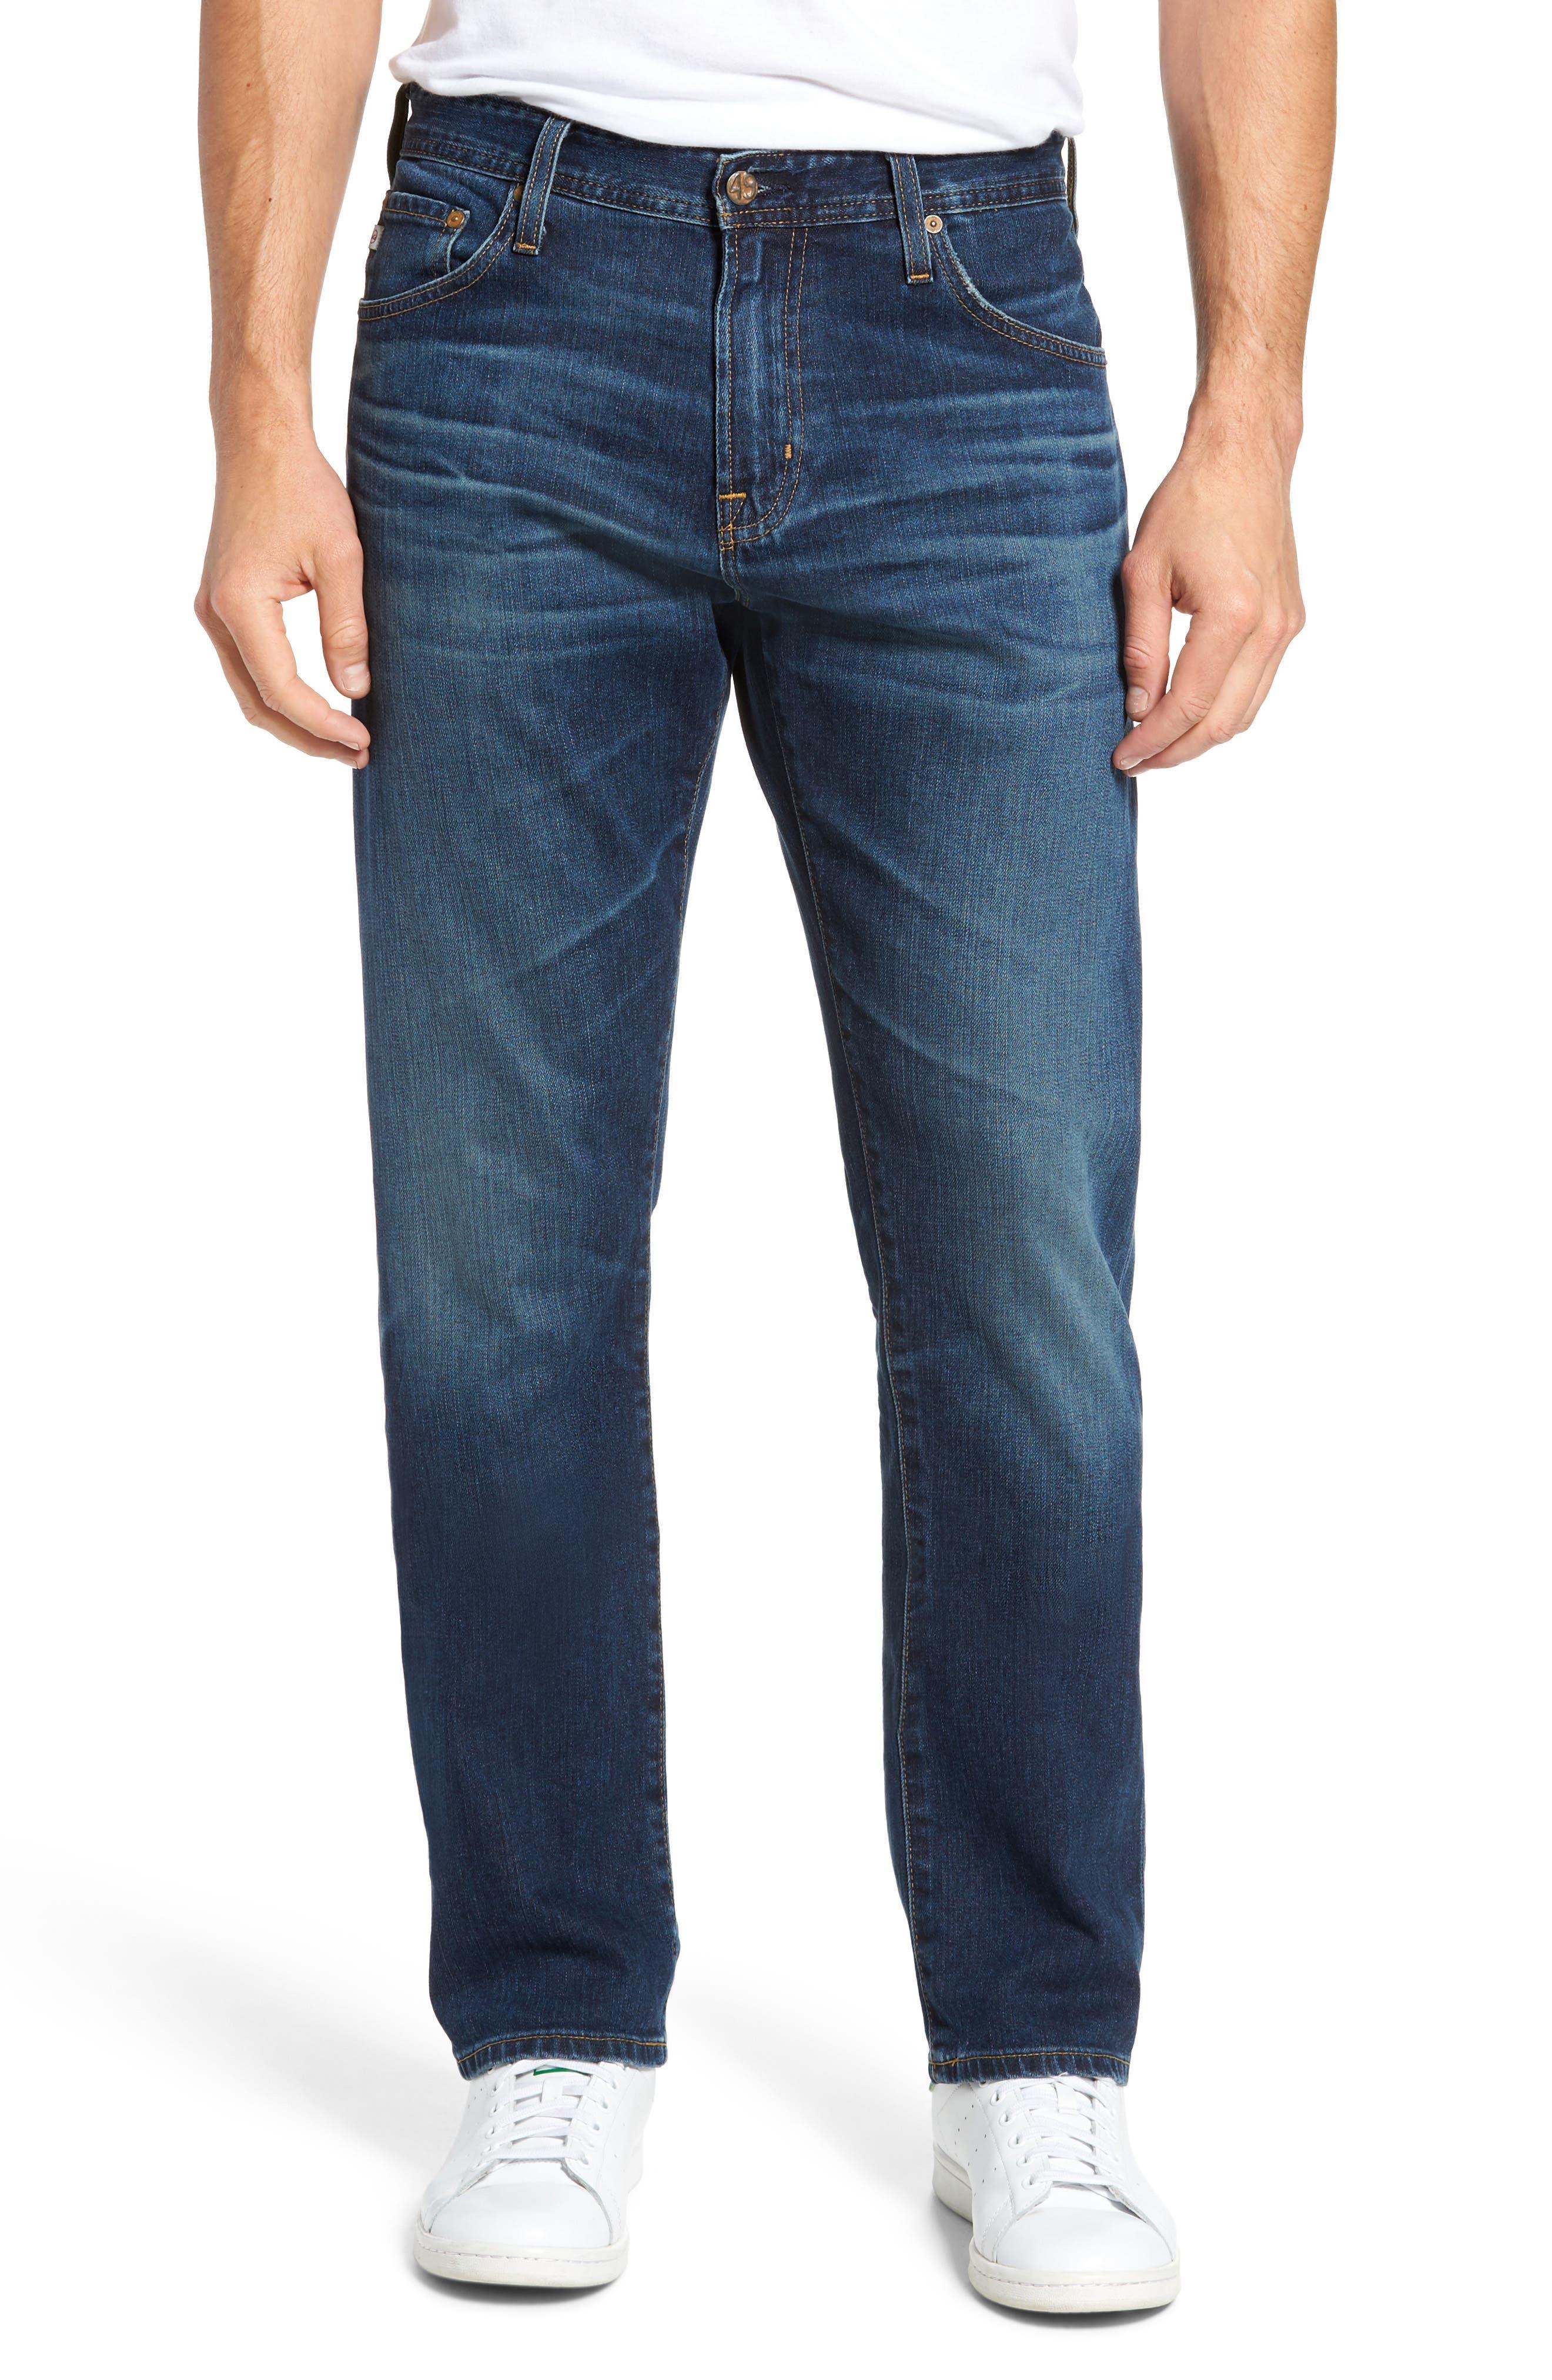 Ives Straight Leg Jeans,                             Main thumbnail 1, color,                             478